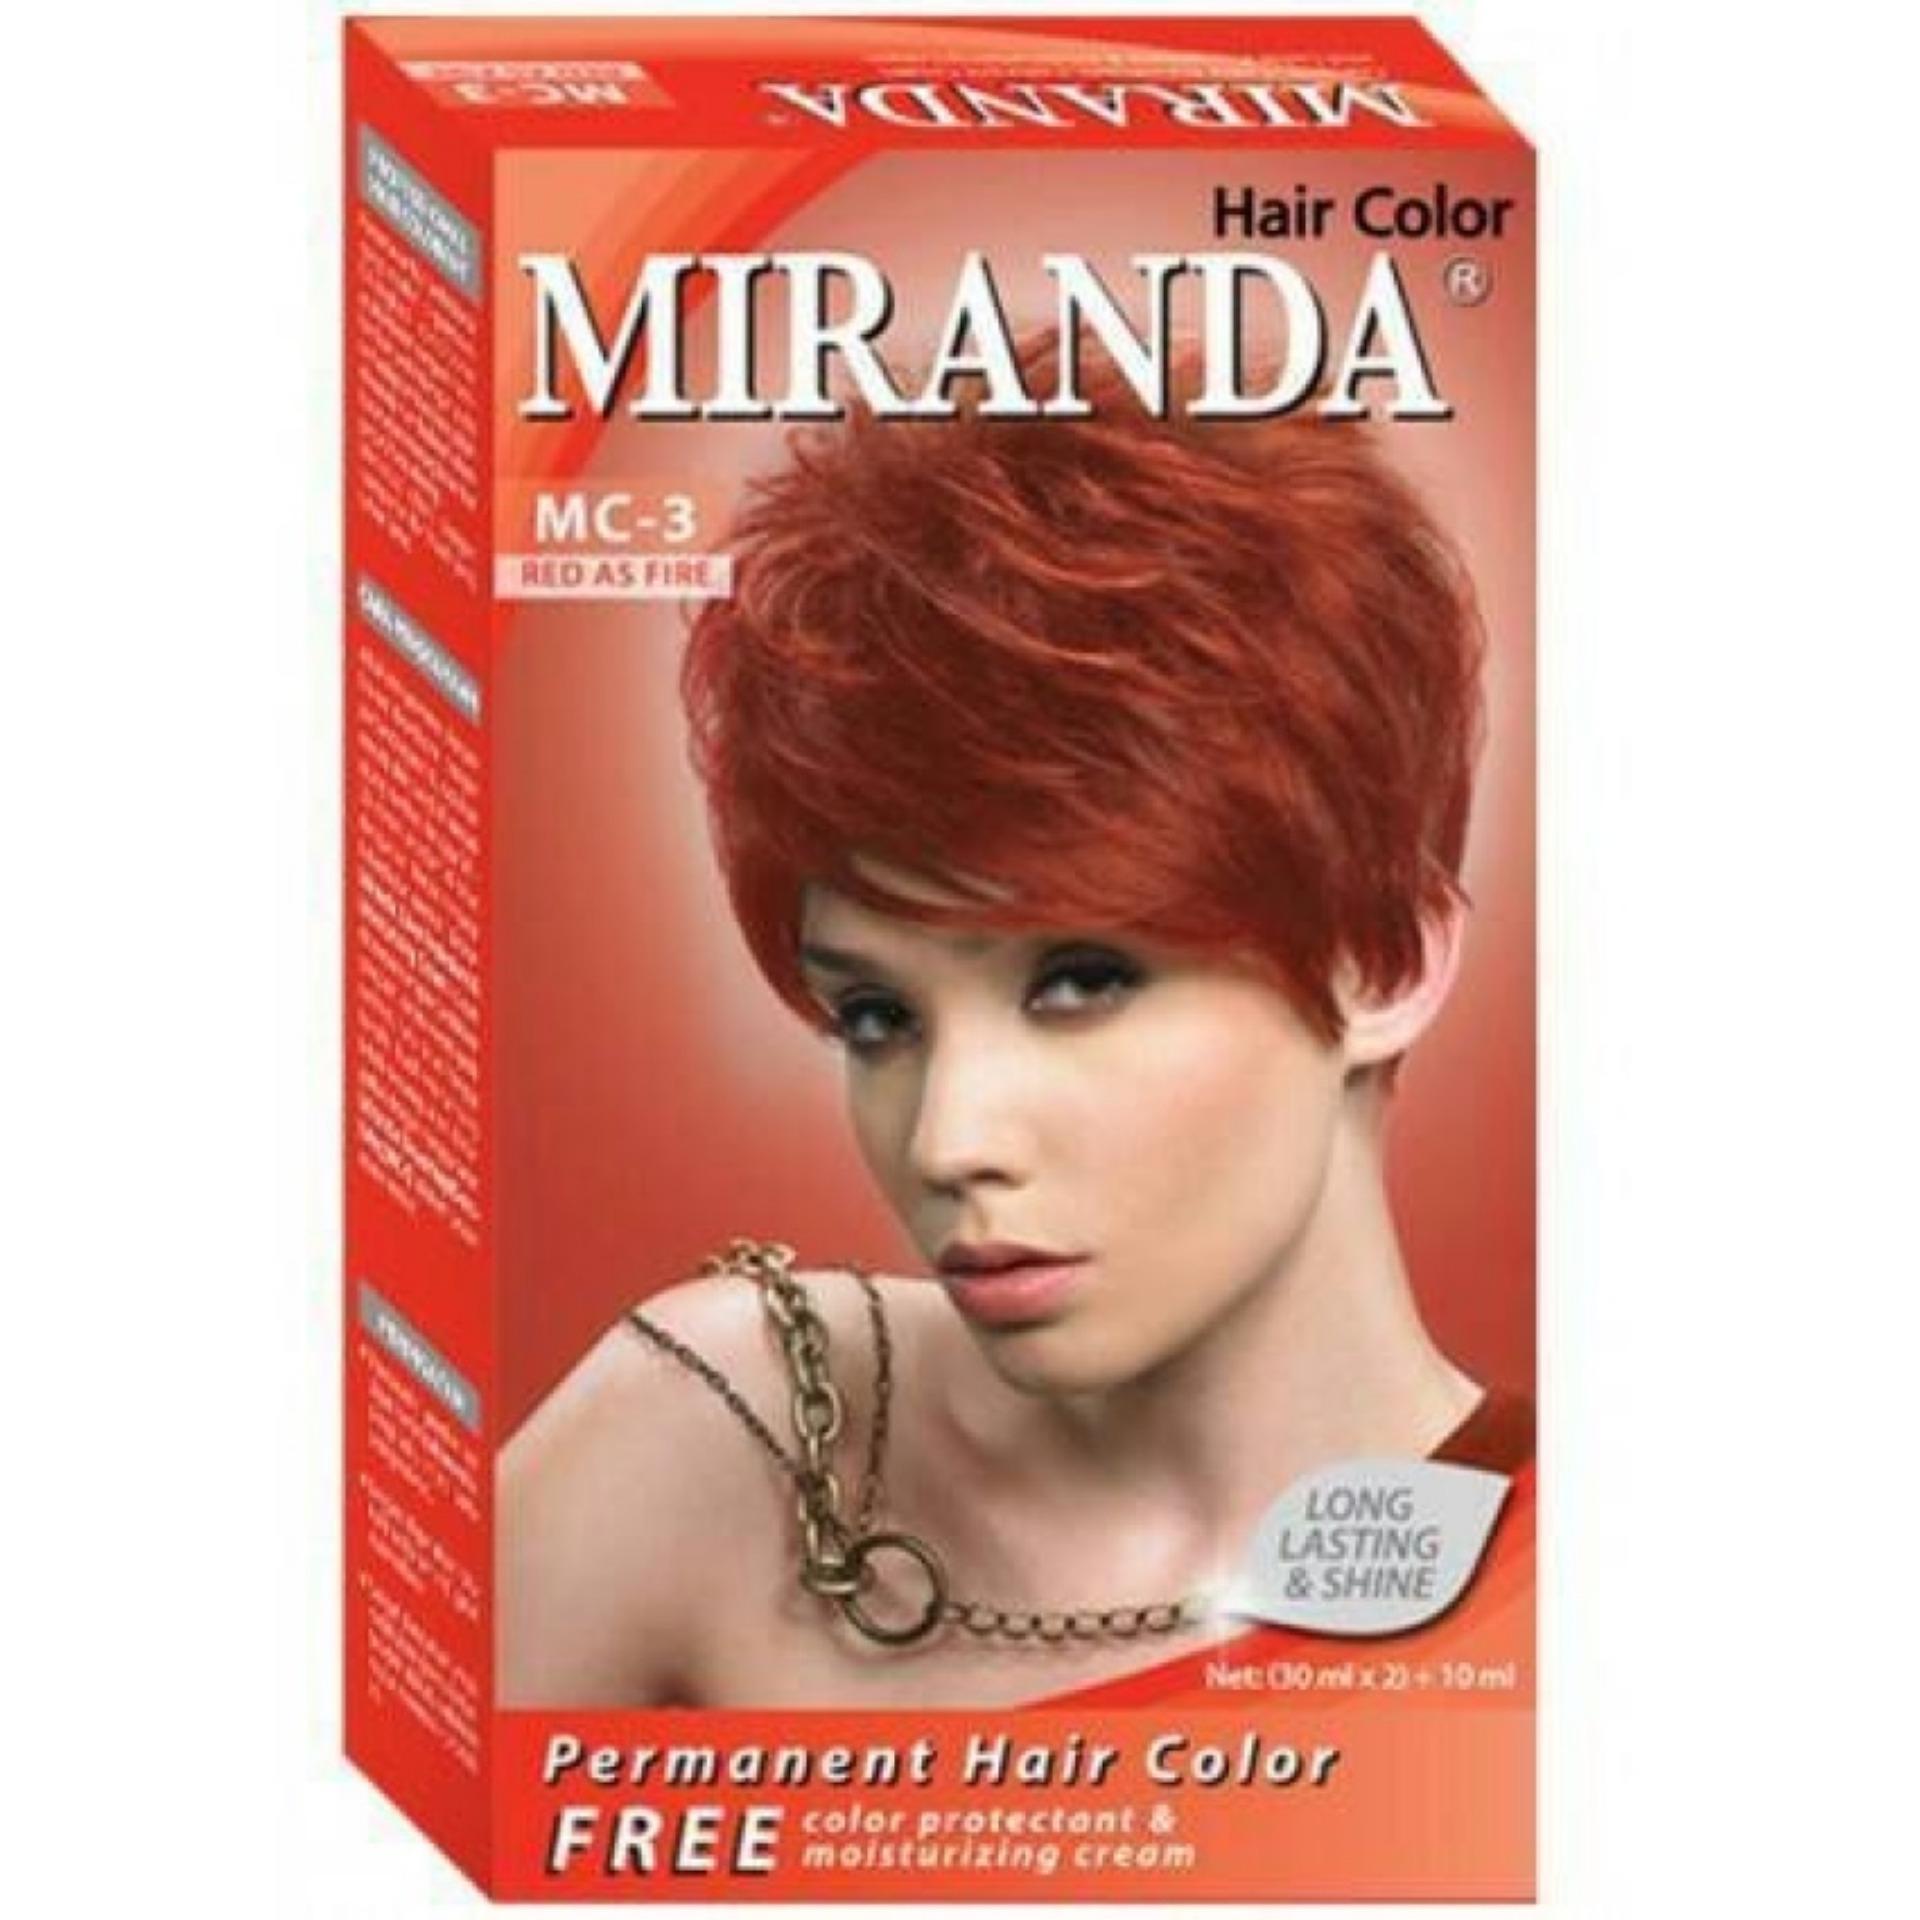 Cari Bandingkan Pewarna Rambut Terlaris Dari Miranda Hair Color Semir Top Cat